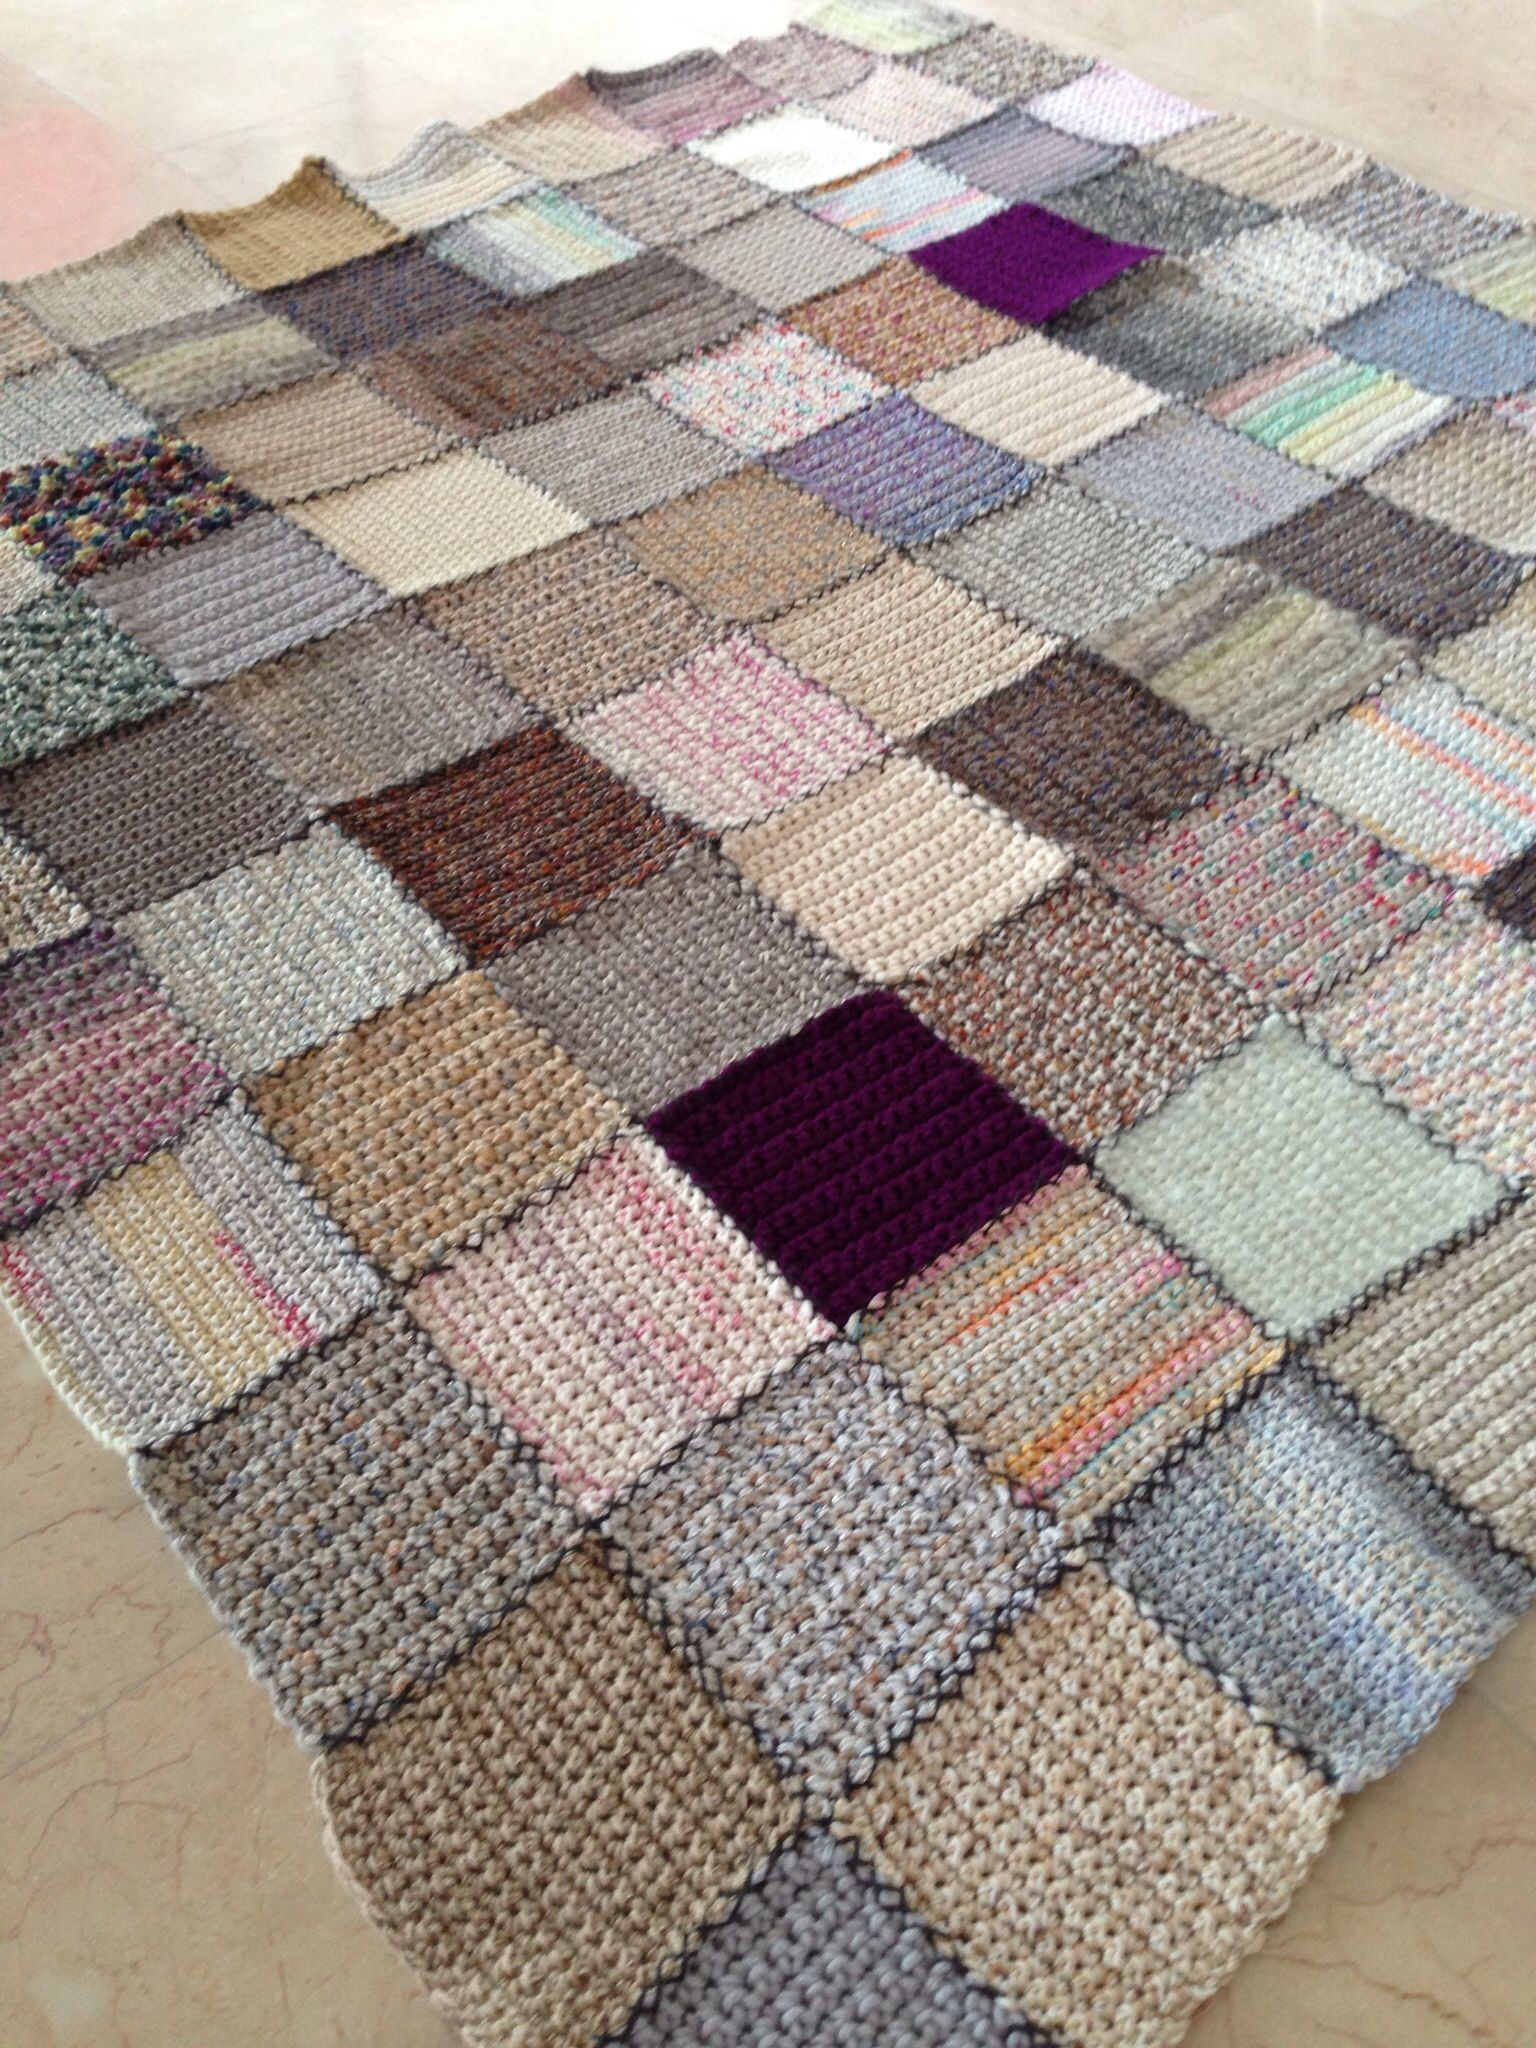 Crochet Patterns Quilt Blocks : Crochet patchwork afghan - no pattern but looks like ...